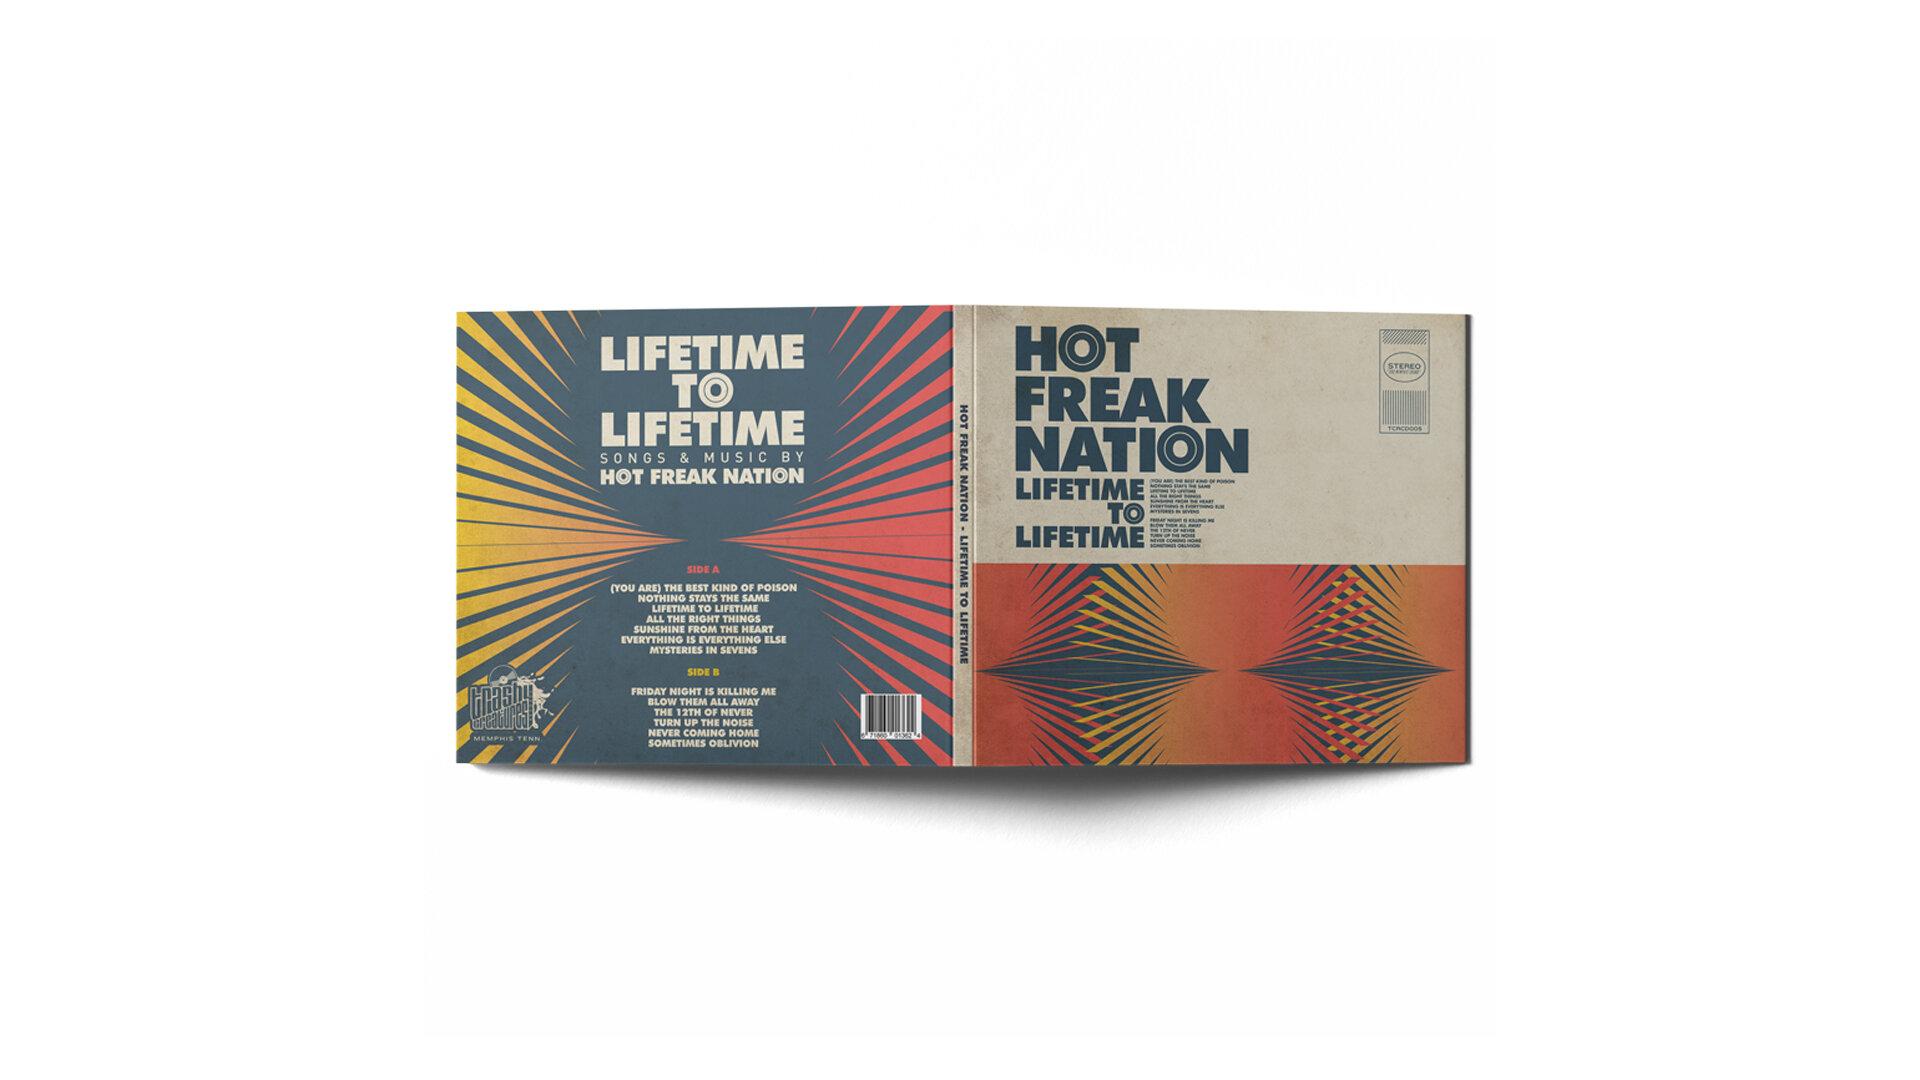 HFN-Lifetime-Digipak-Mockup-Exterior.jpg